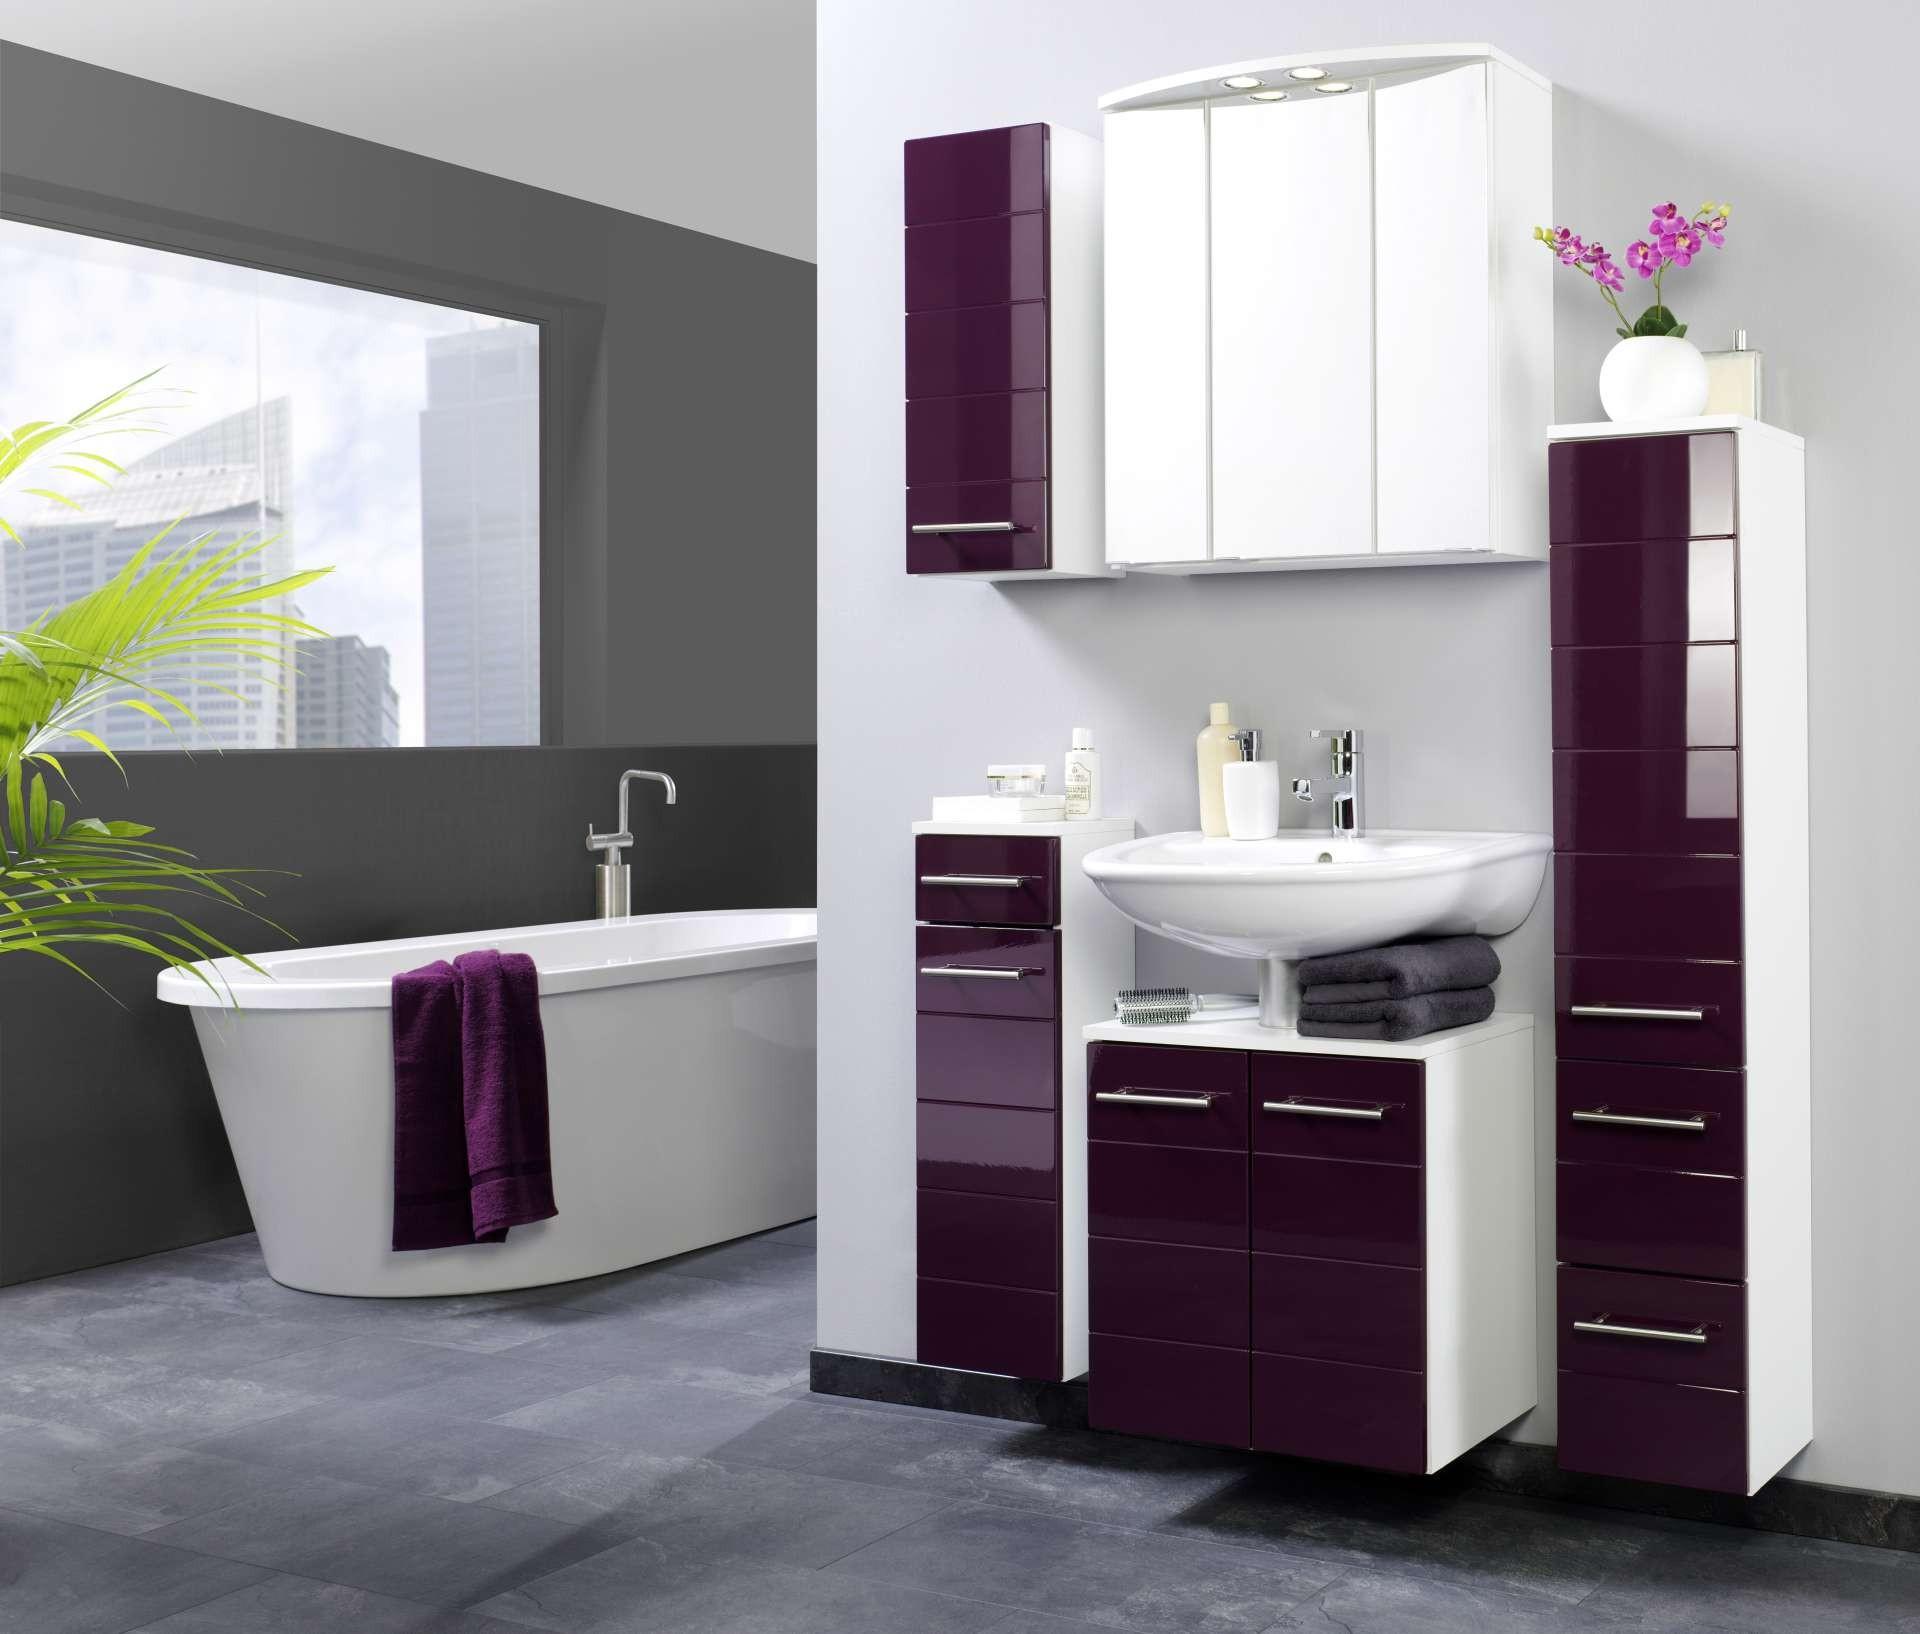 bad unterschrank rimini 1 t rig 1 schublade 25 cm breit hochglanz aubergine bad bad. Black Bedroom Furniture Sets. Home Design Ideas